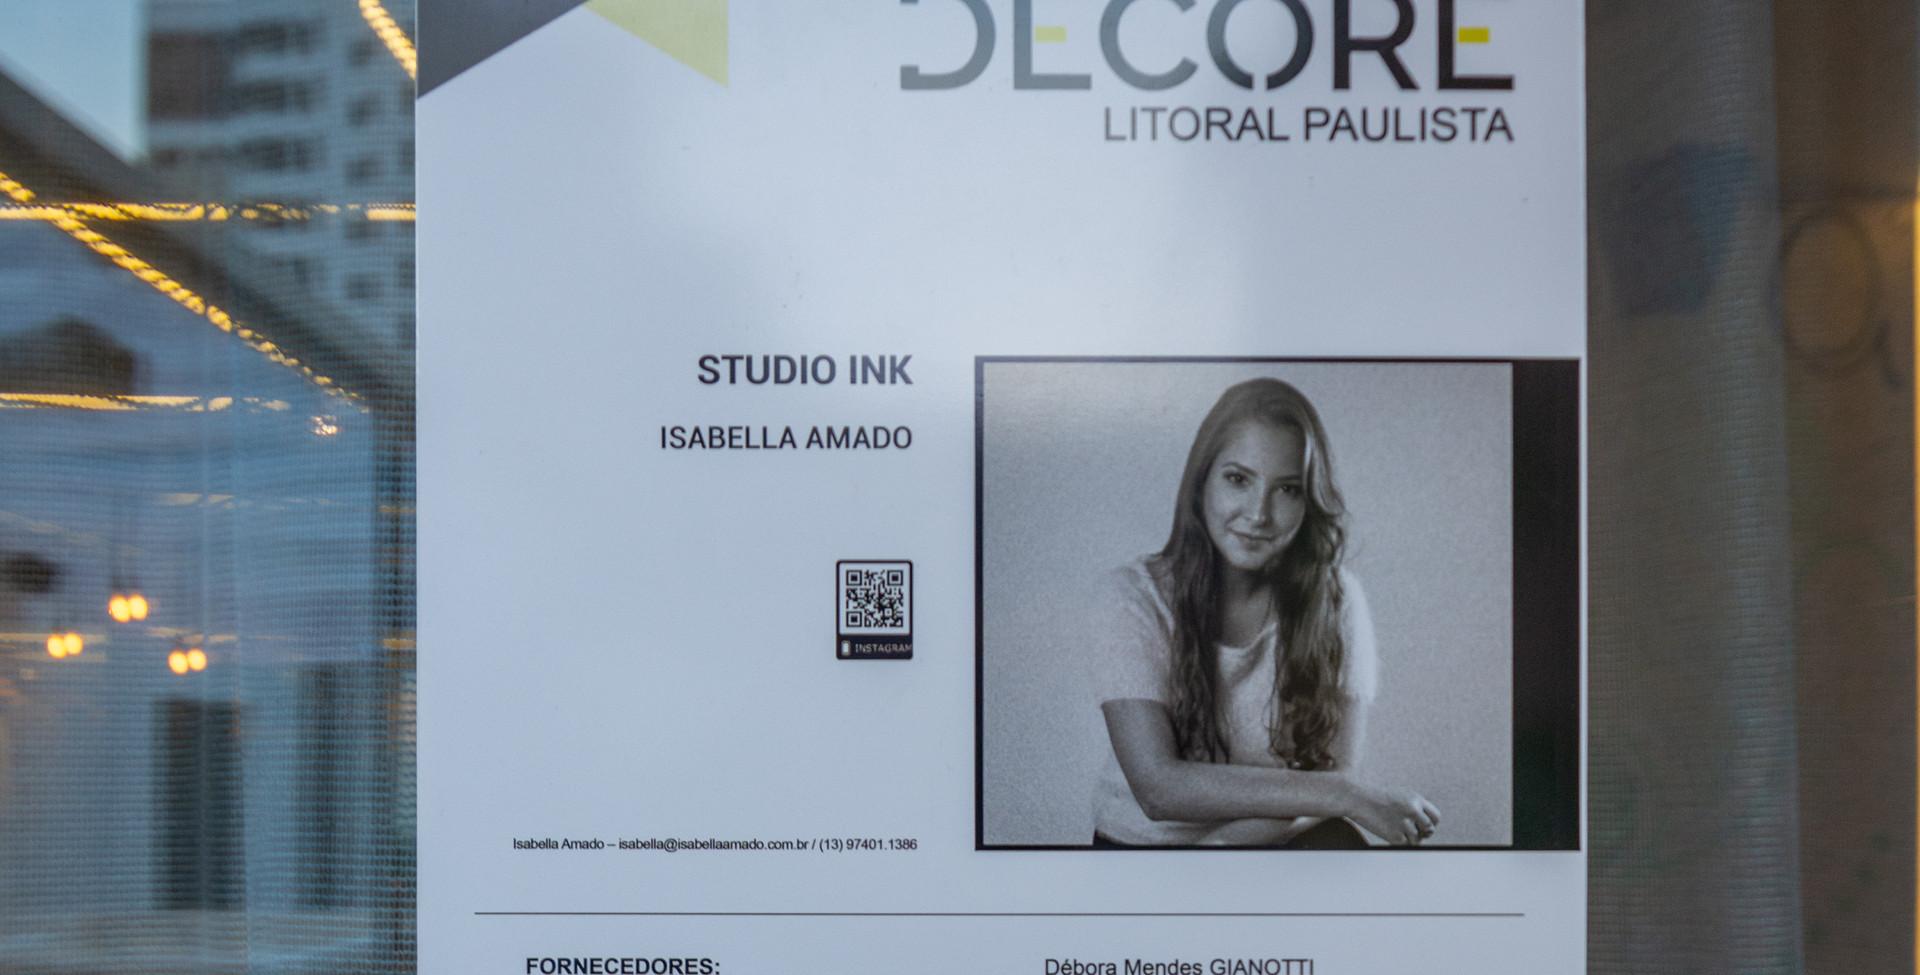 Mostra Decore 2019 Isabella Amado-1.JPG